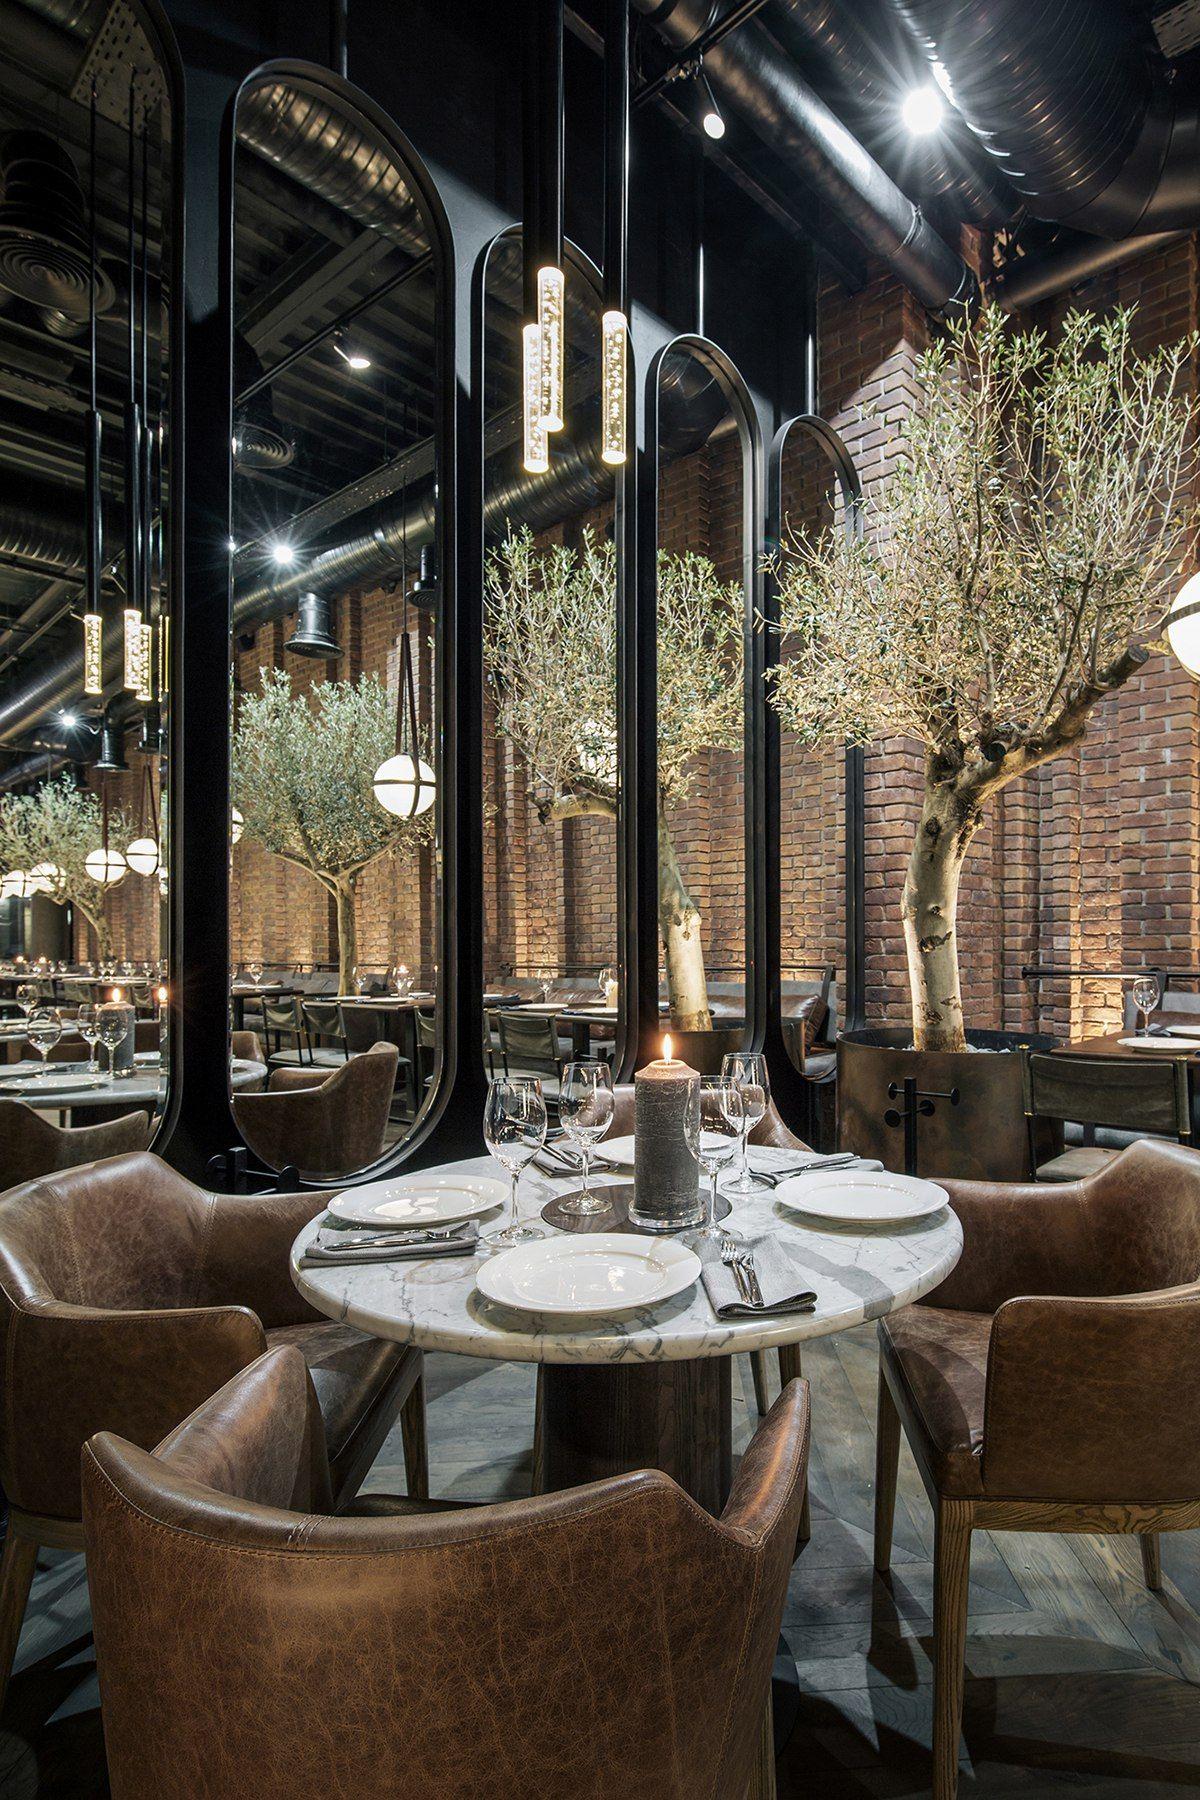 Intelligent architecture | Interior Design: Restaurants, Cafes and ...